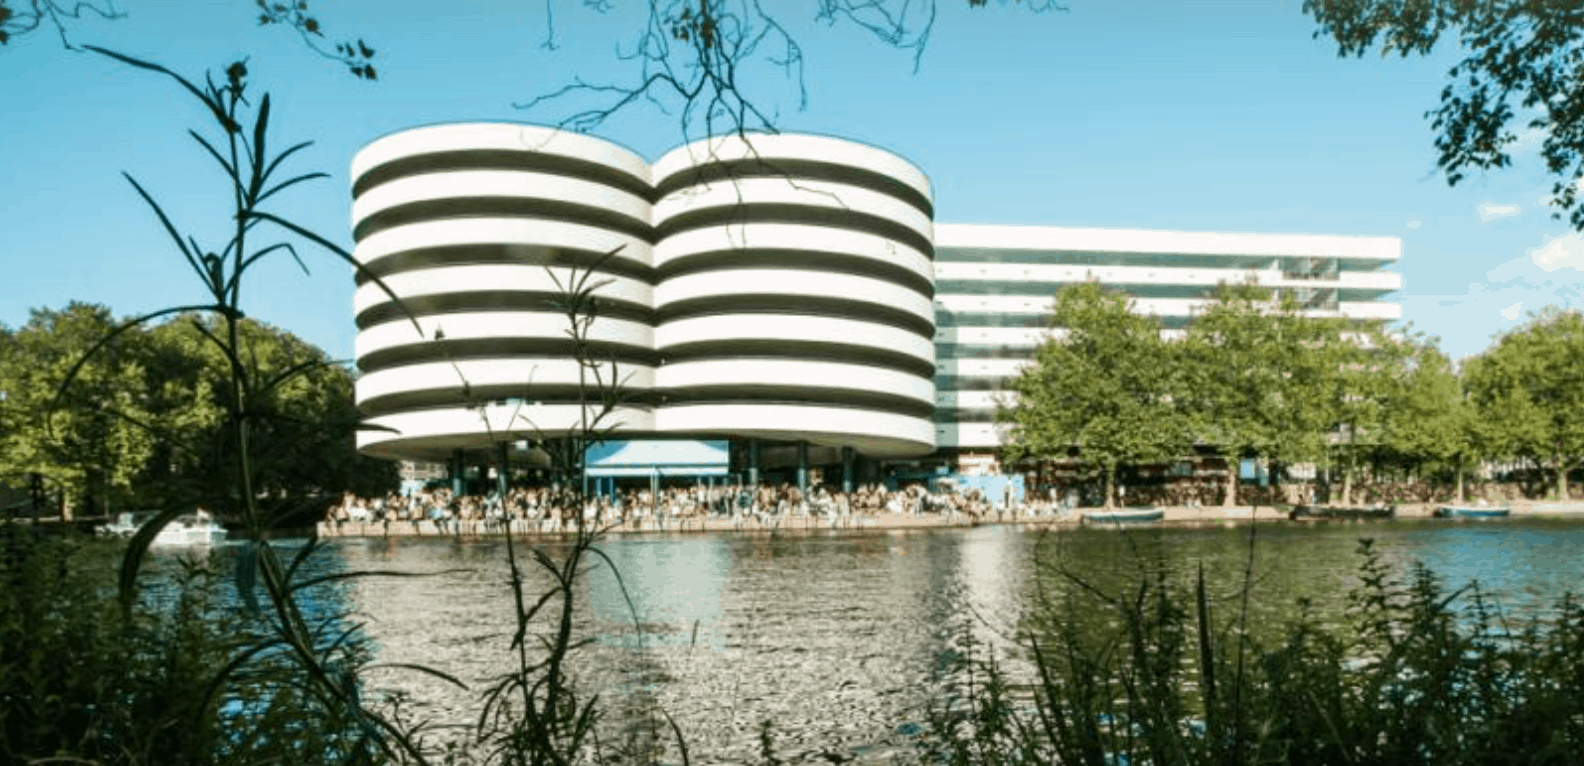 8x hotspots van jelmer de boer citystyleguide for Jelmer de boer